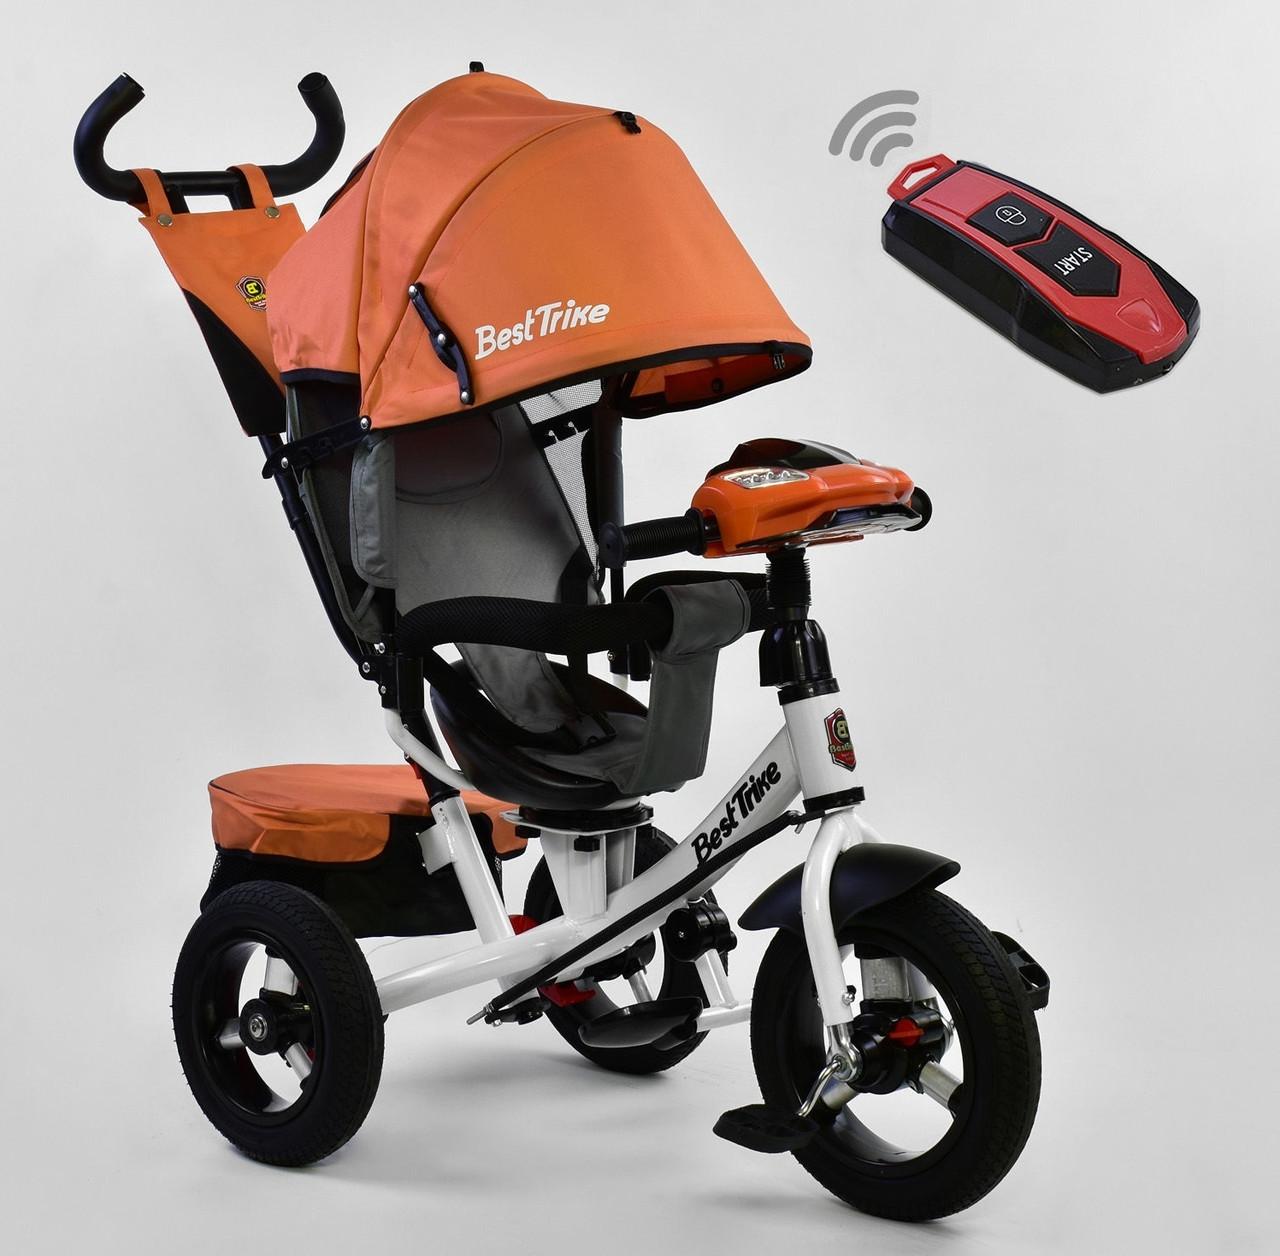 Best Trike Велосипед Best Trike 7700 B 6090 New Orange / Black (7700 BN)